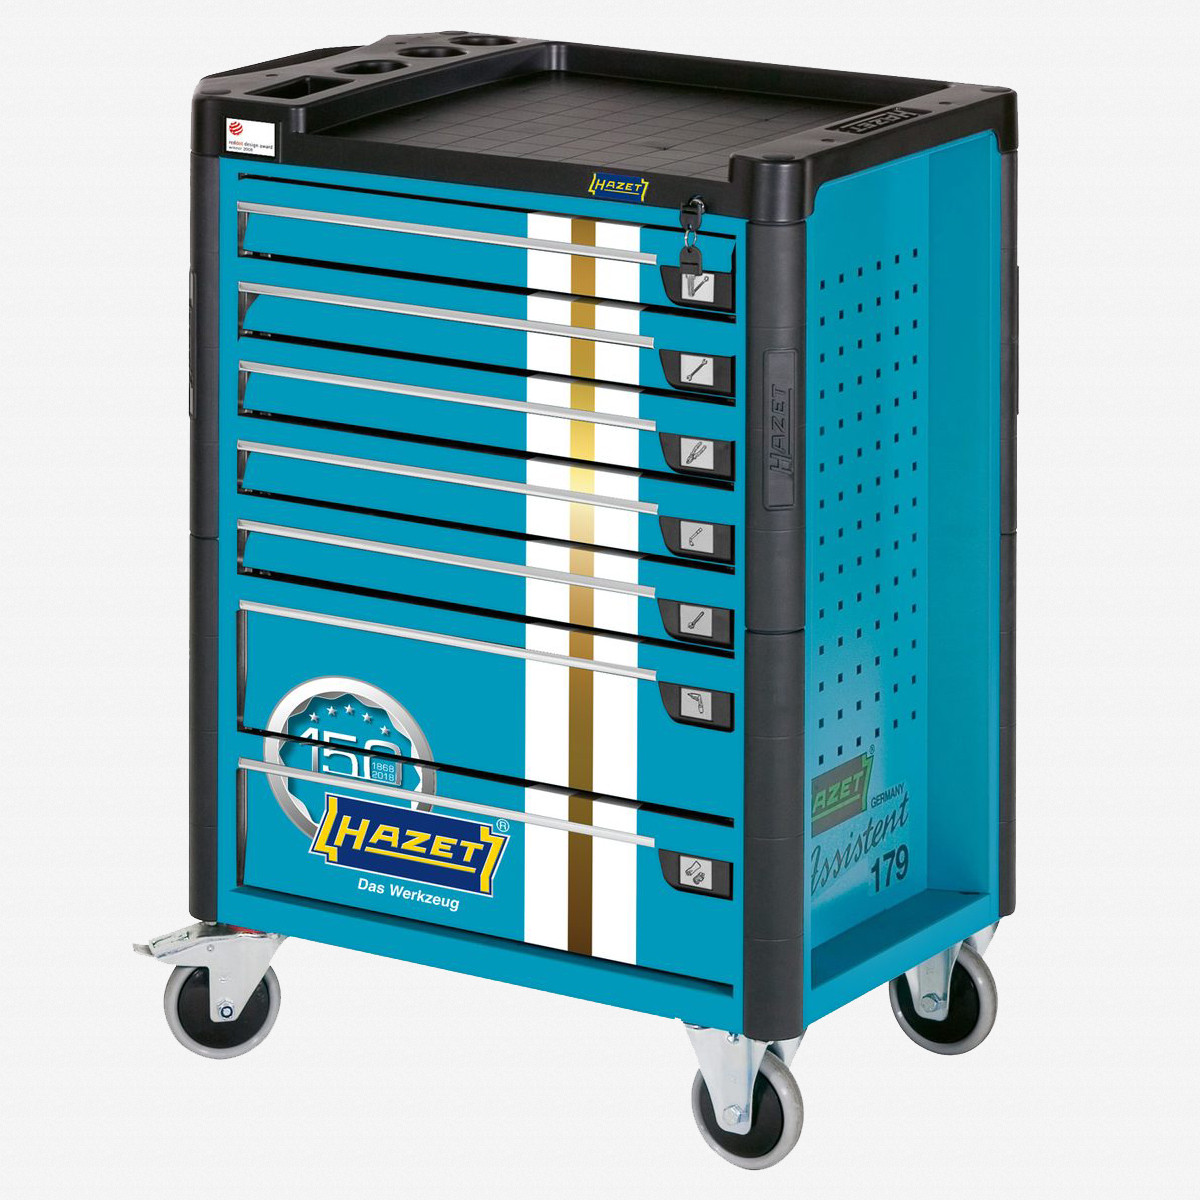 Hazet 179-7J 150th Anniversary Limited Edition Tool Trolley - Blue - KC Tool